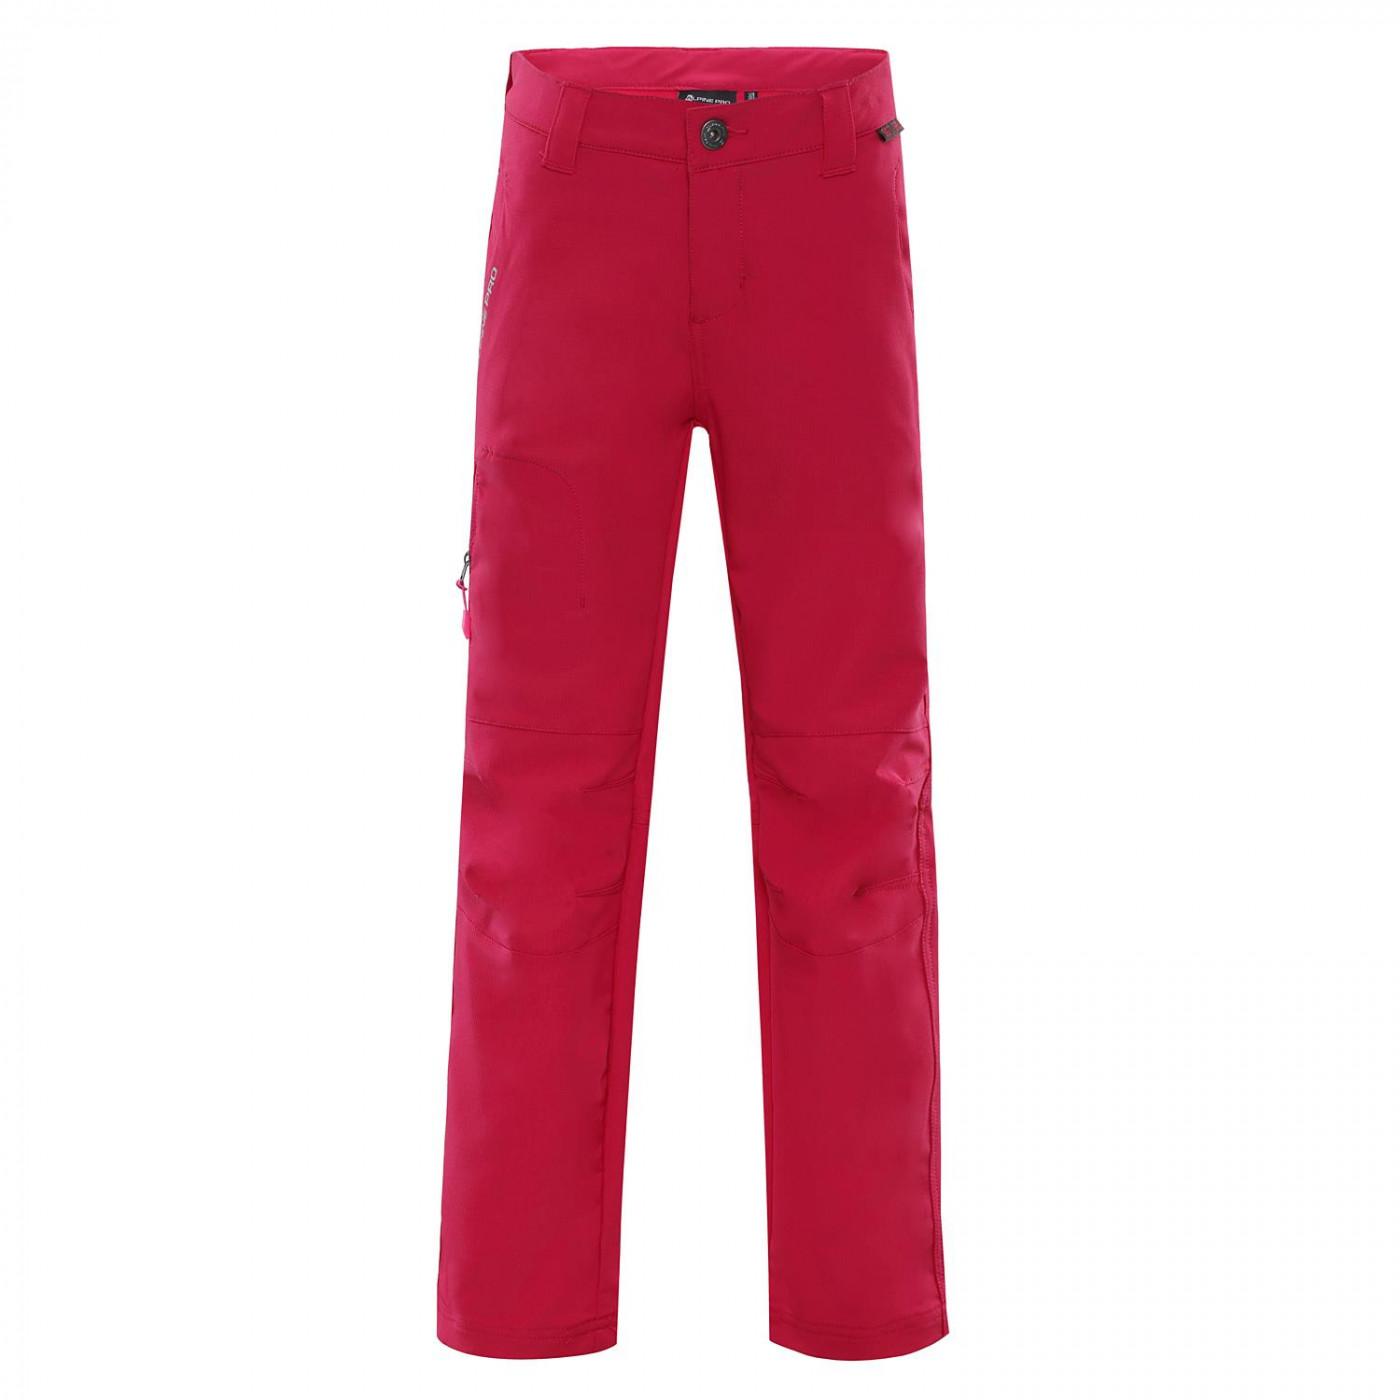 ALPINE PRO PLATAN baby softshell pants 2